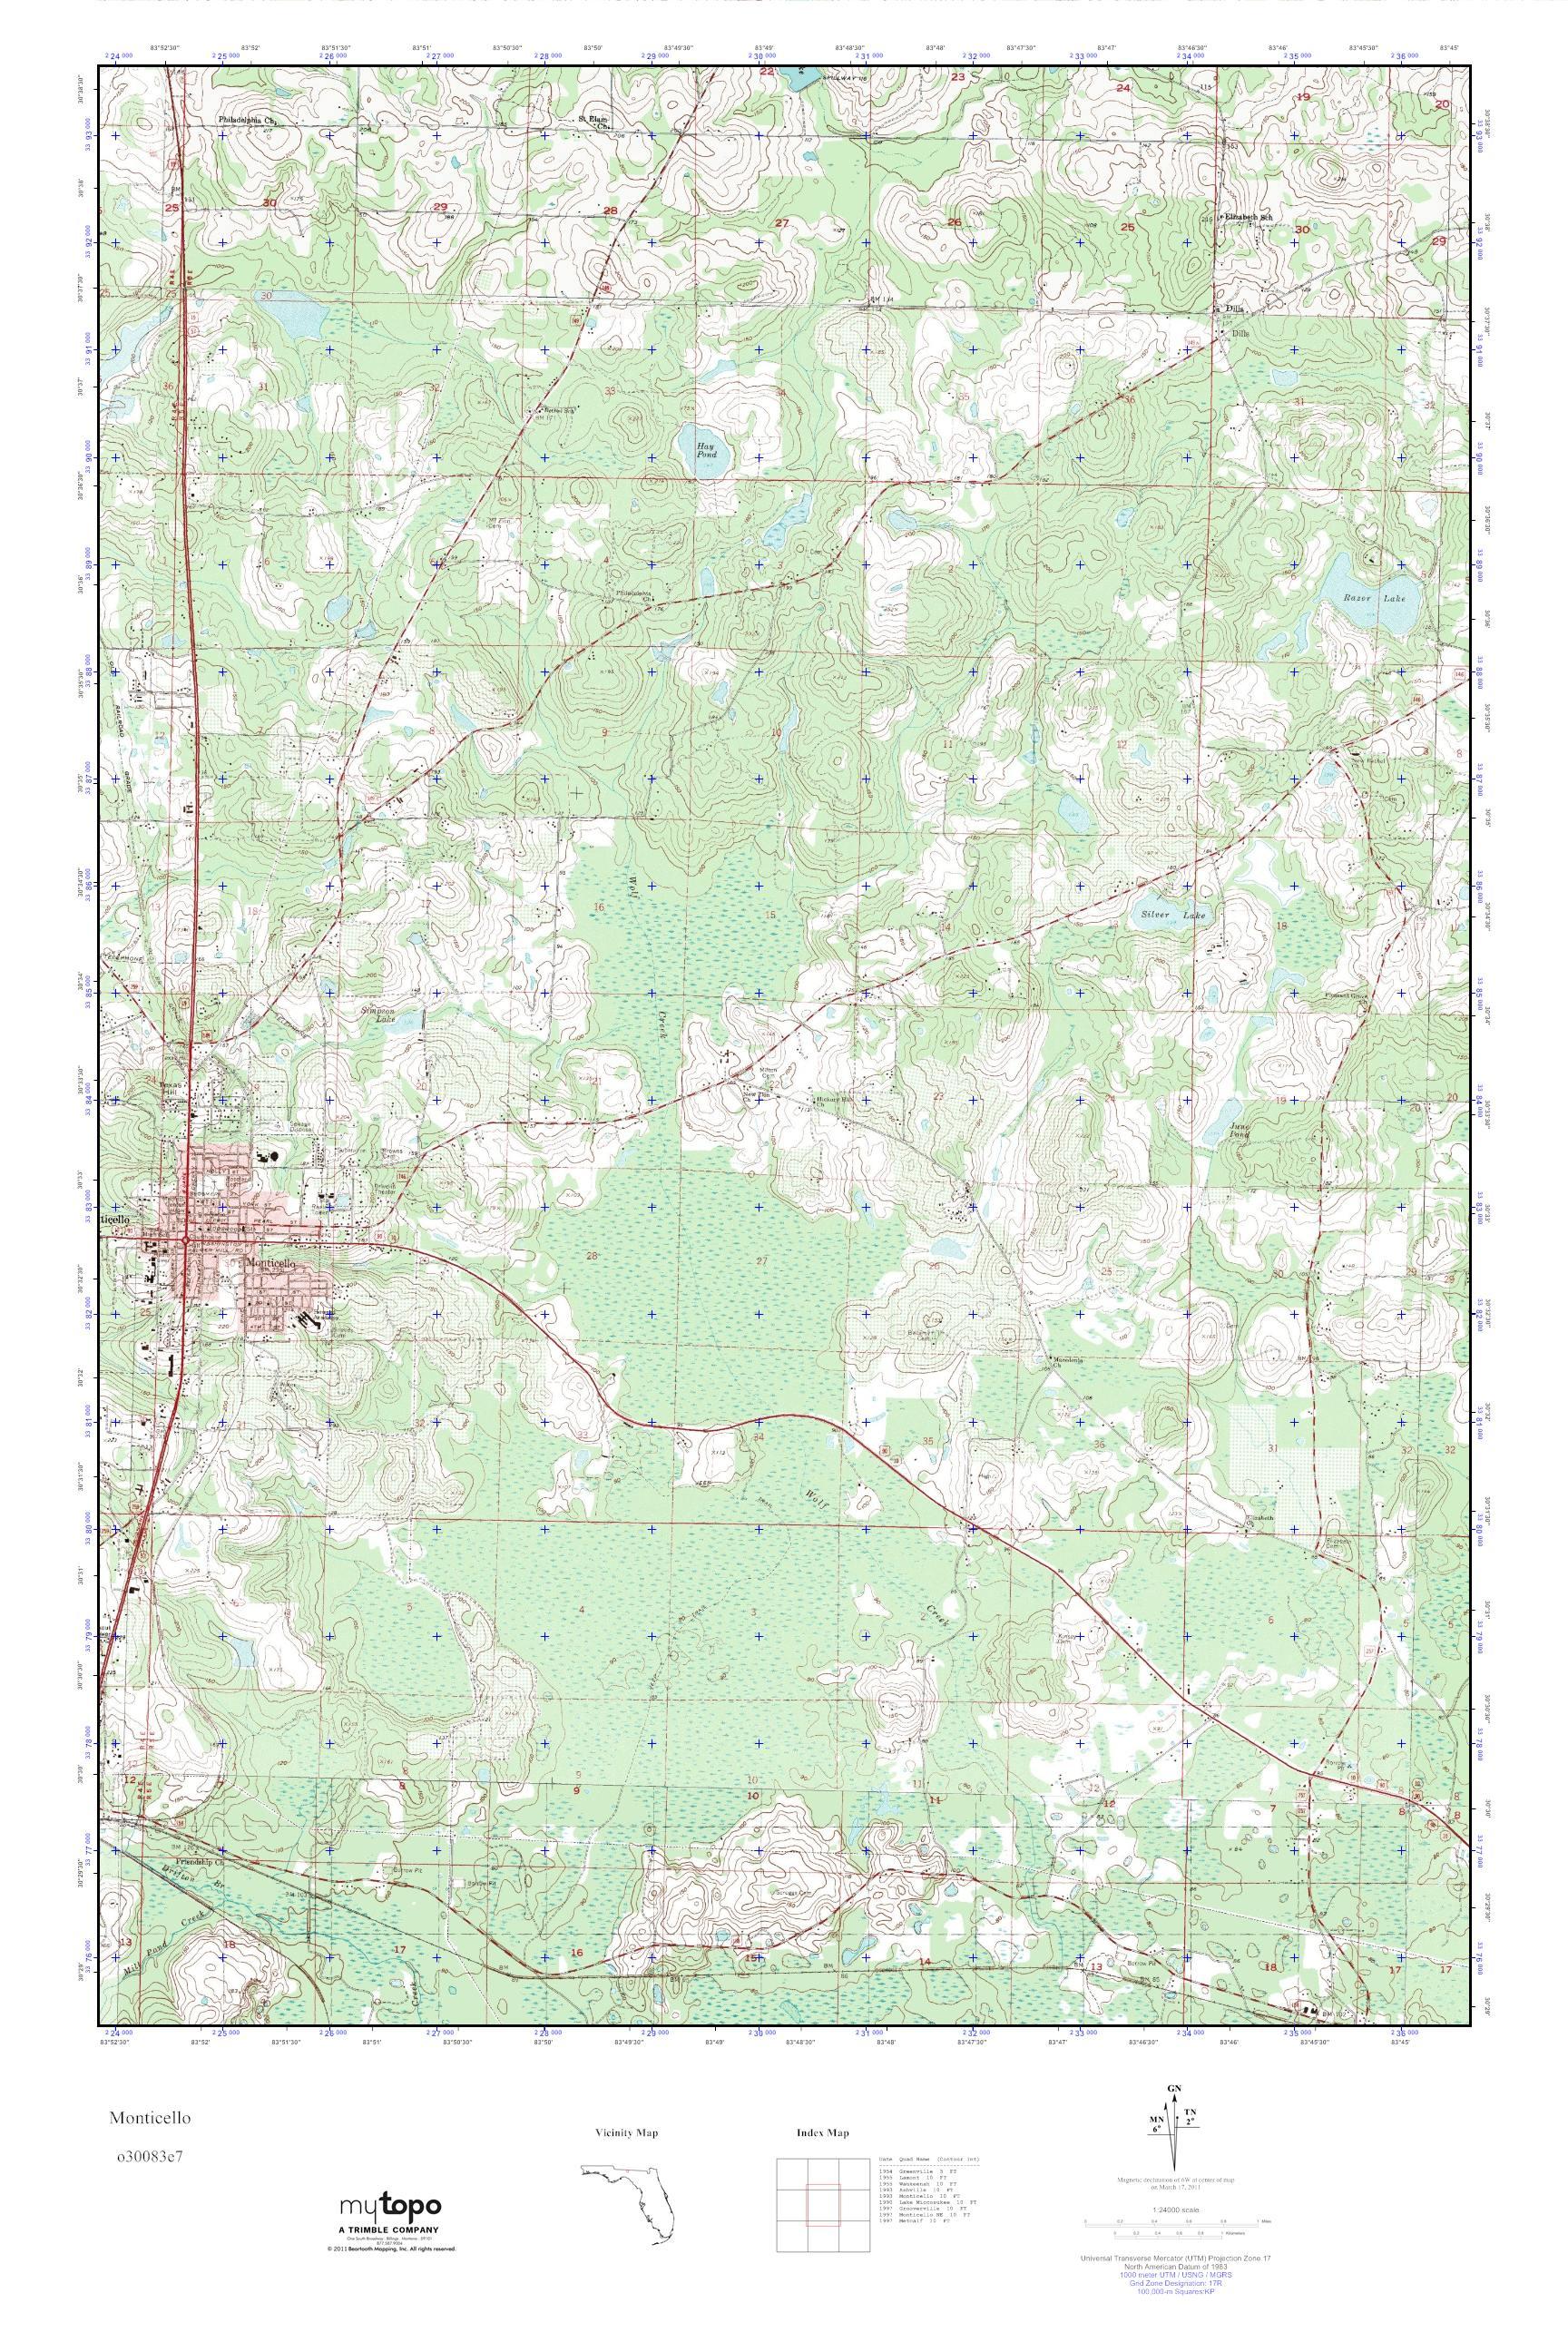 Mytopo Monticello Florida Usgs Quad Topo Map